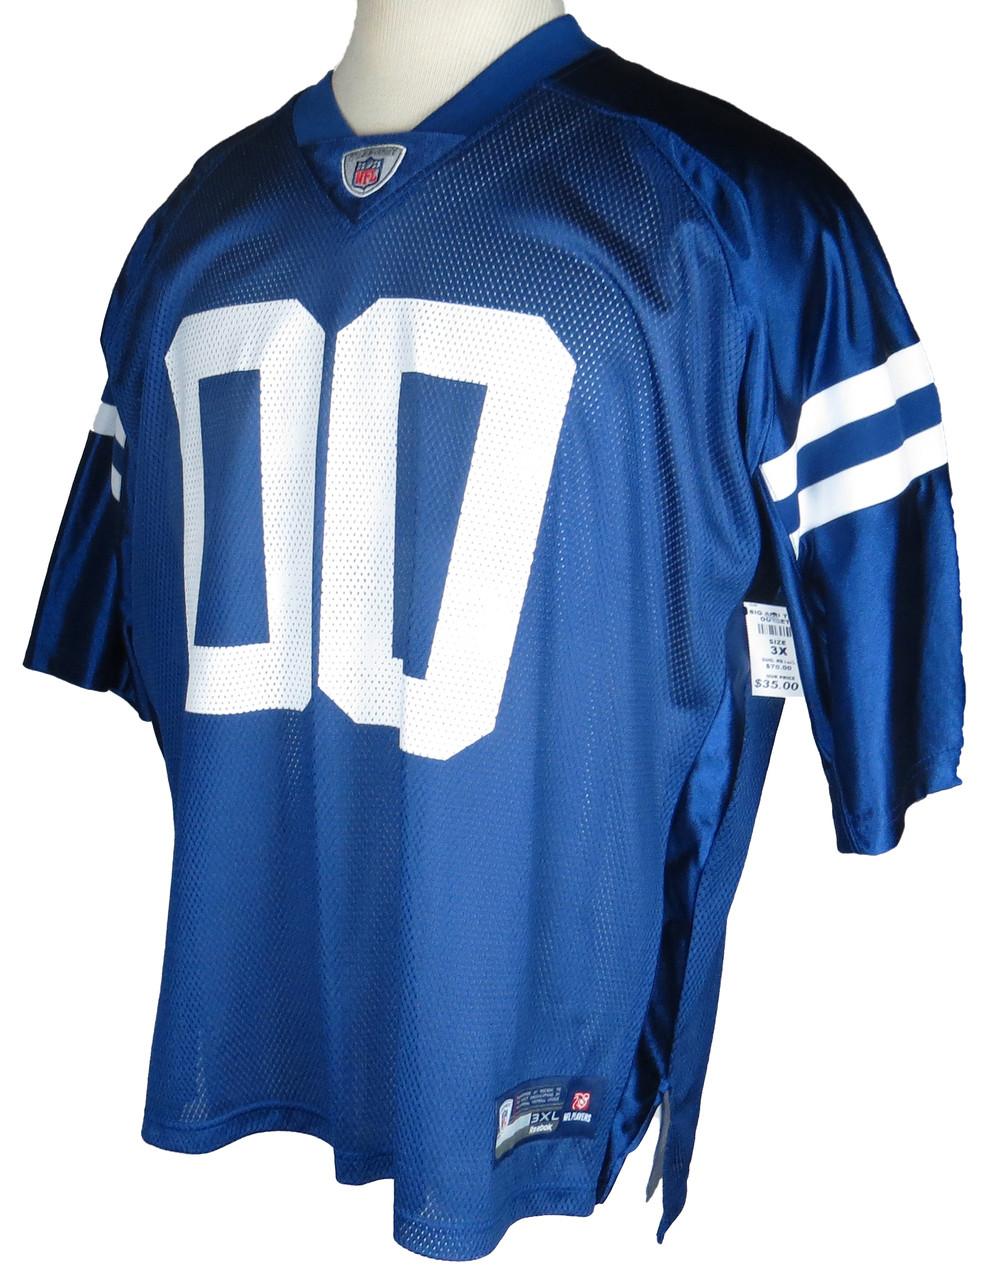 NFL 00 Jerseys 4 Teams 3X, 4X, 5X